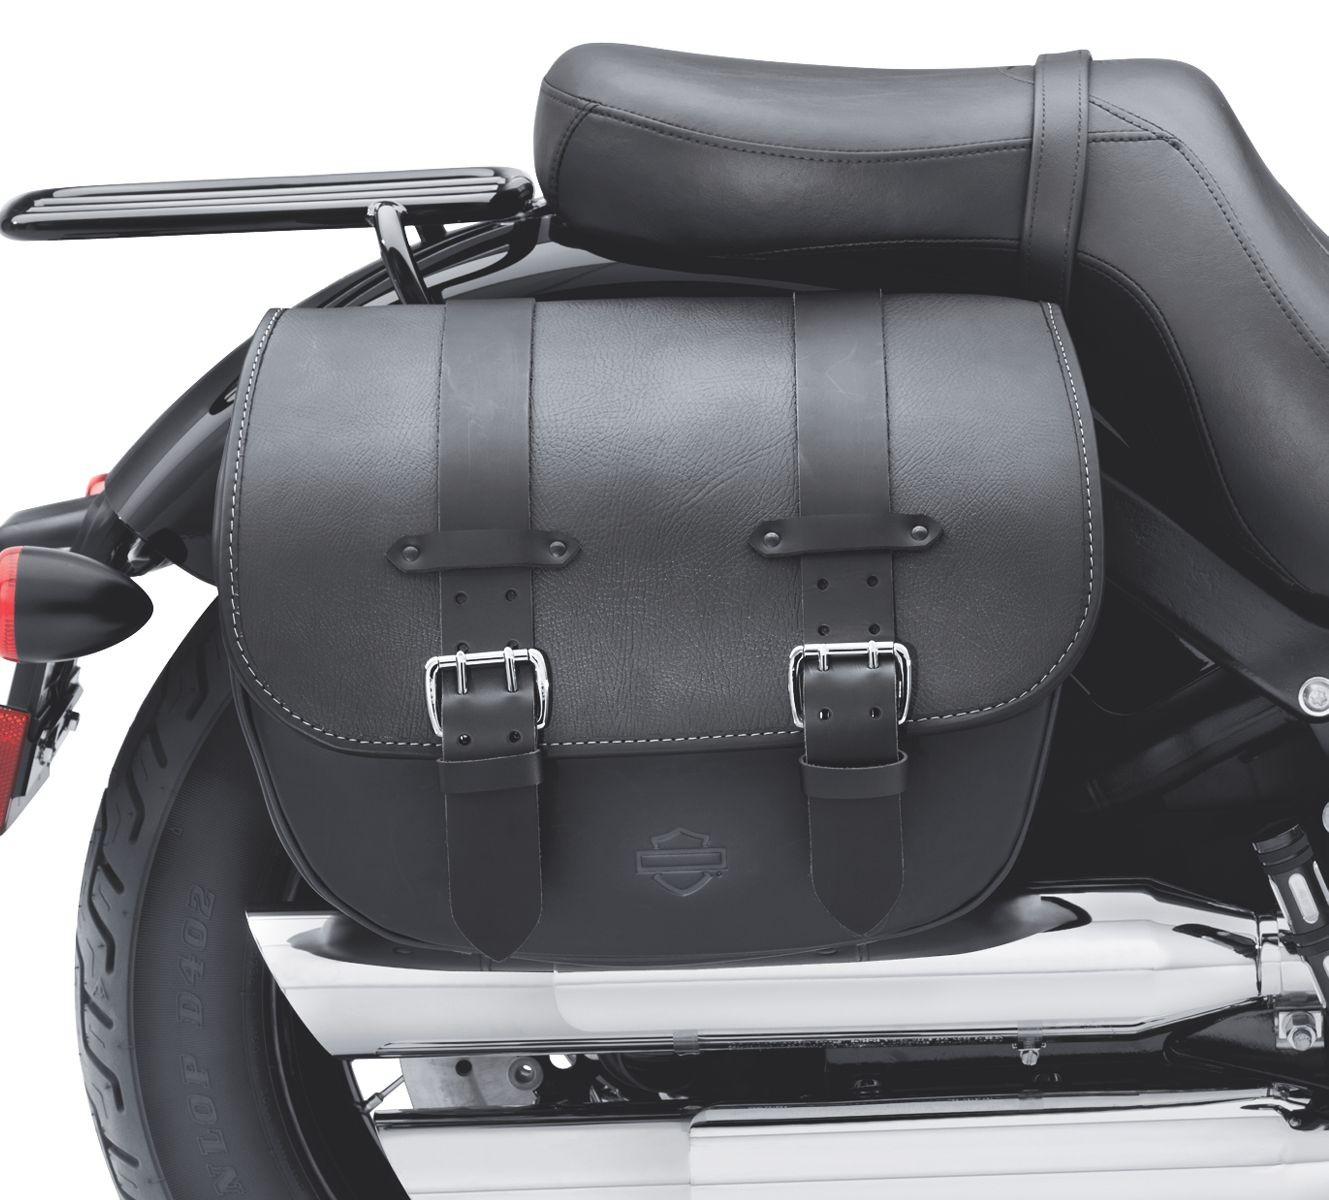 90200353b Harley Davidson H D Detachables Leather Saddlebags Protectant Softail Slim And Blackline Models Manchester